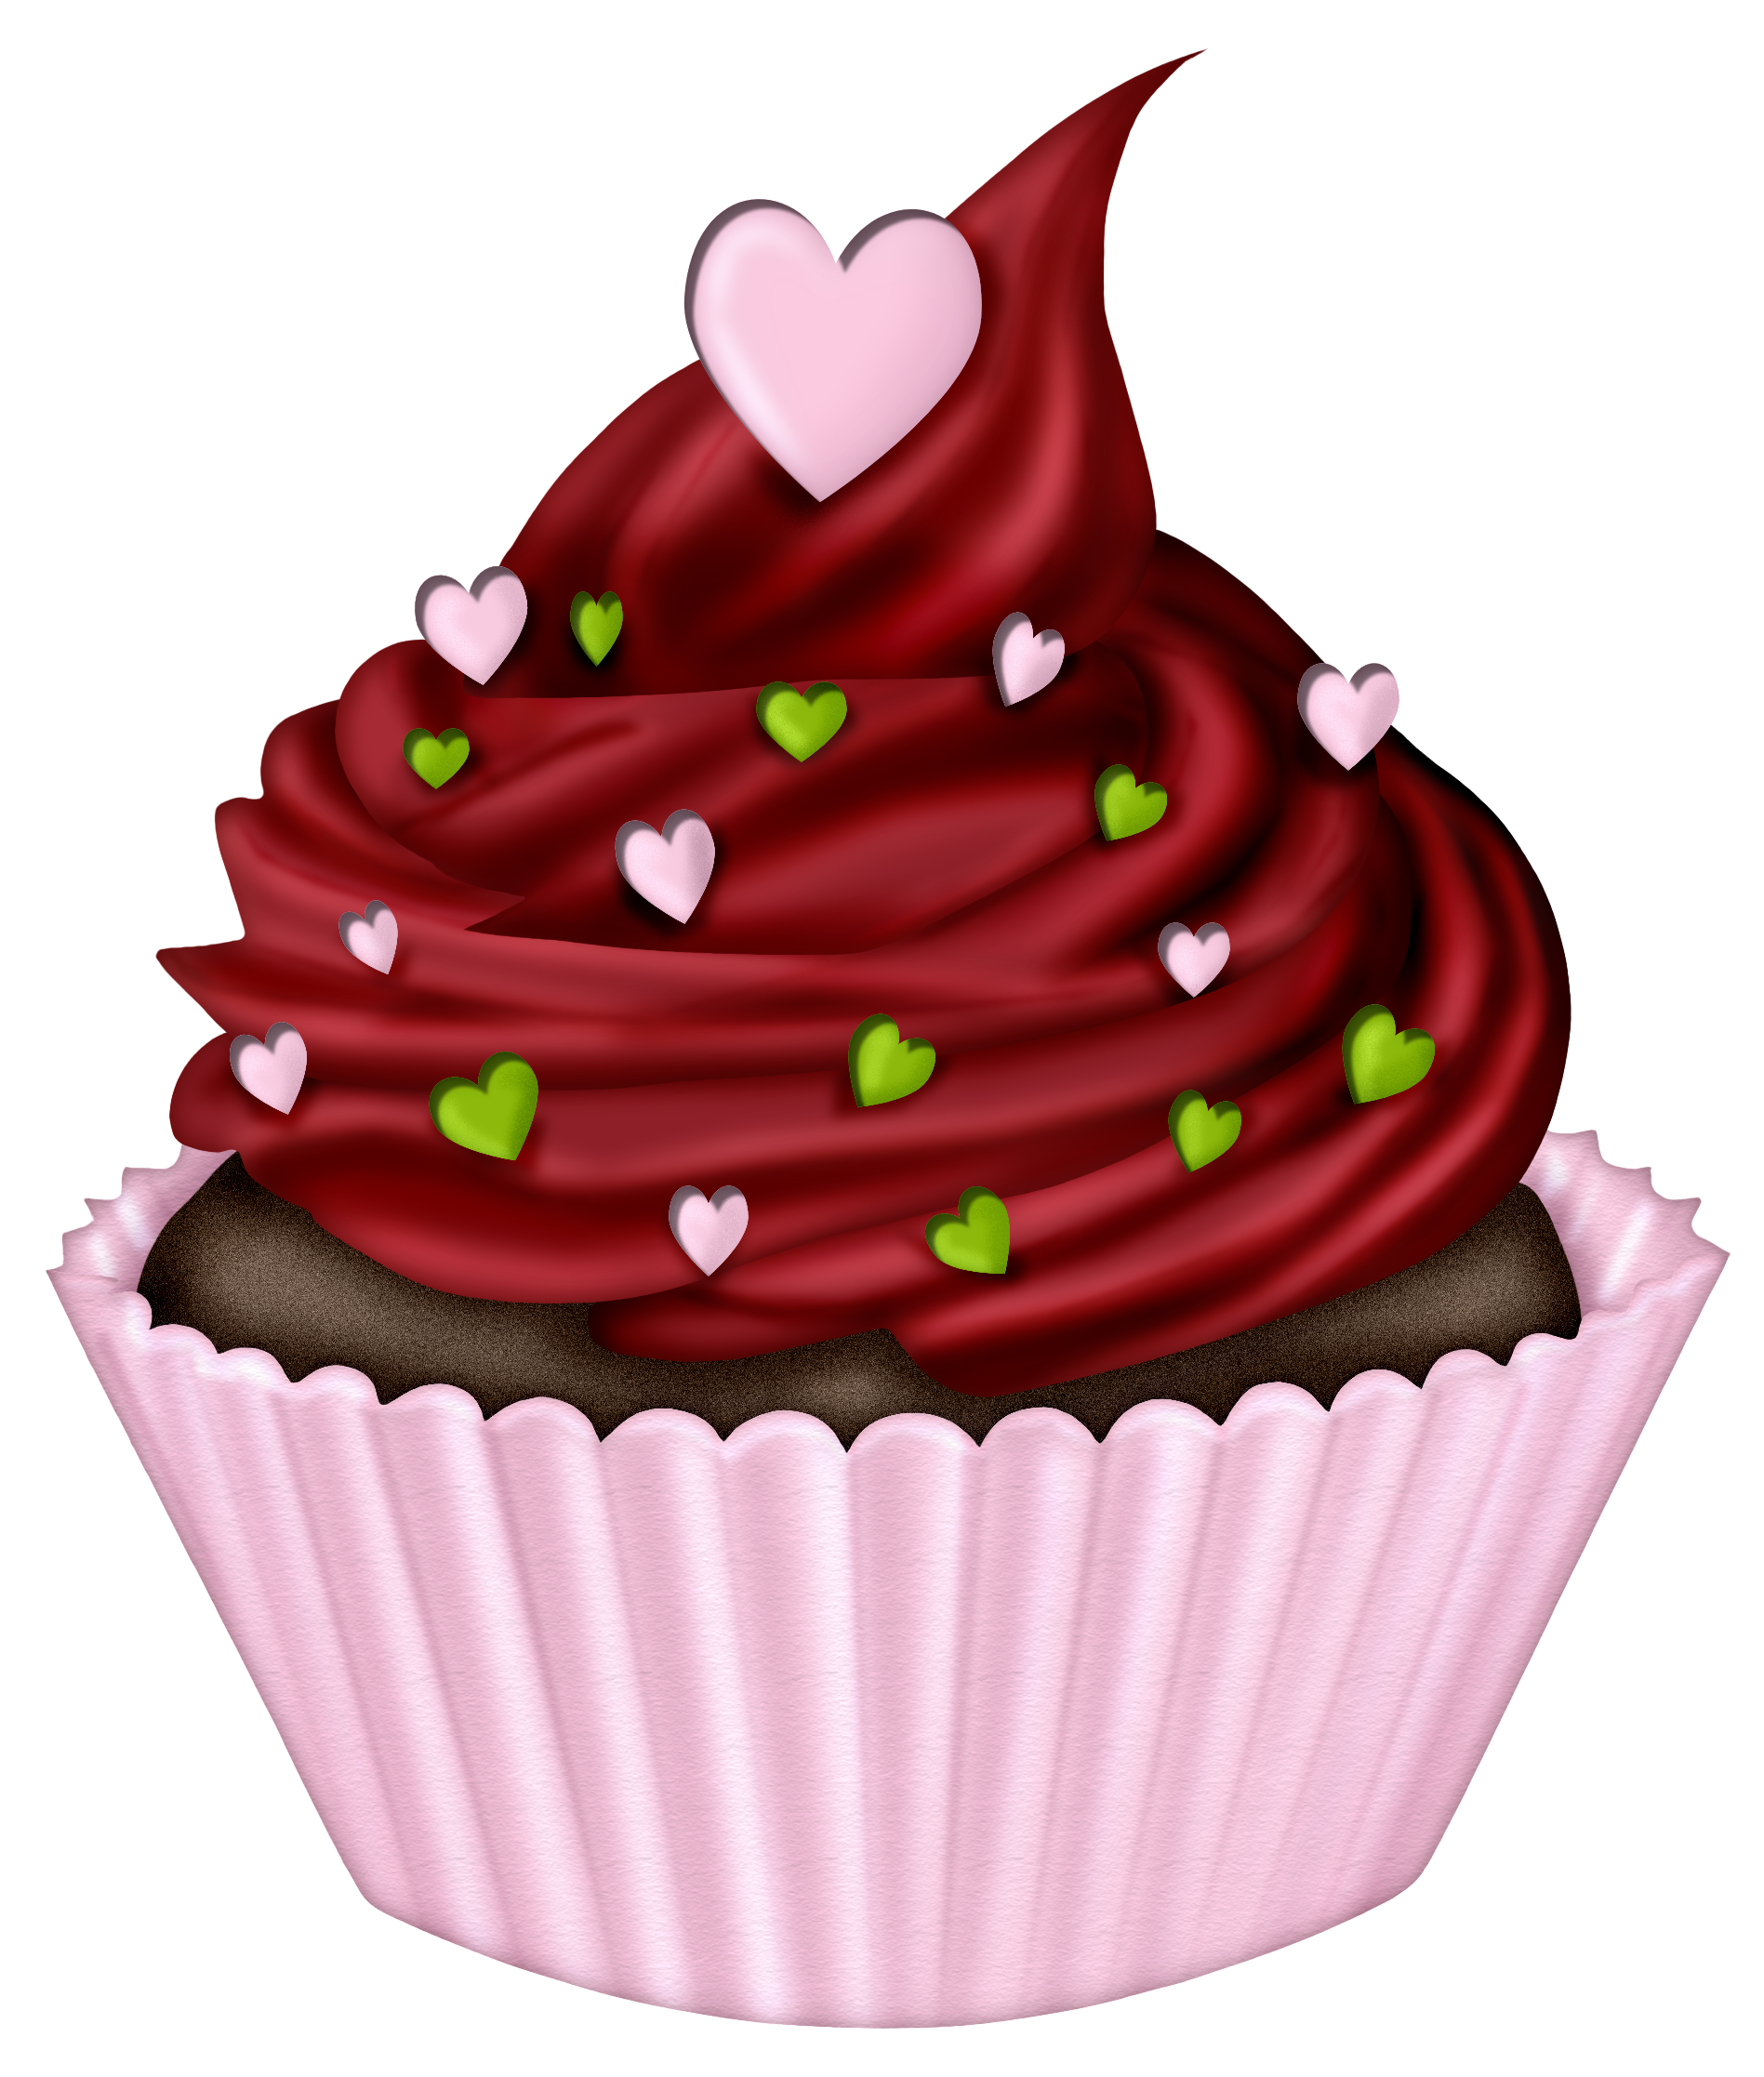 Cupcakes‿ ⁀°•• Cupcake cakes, Cupcake clipart, Cupcake